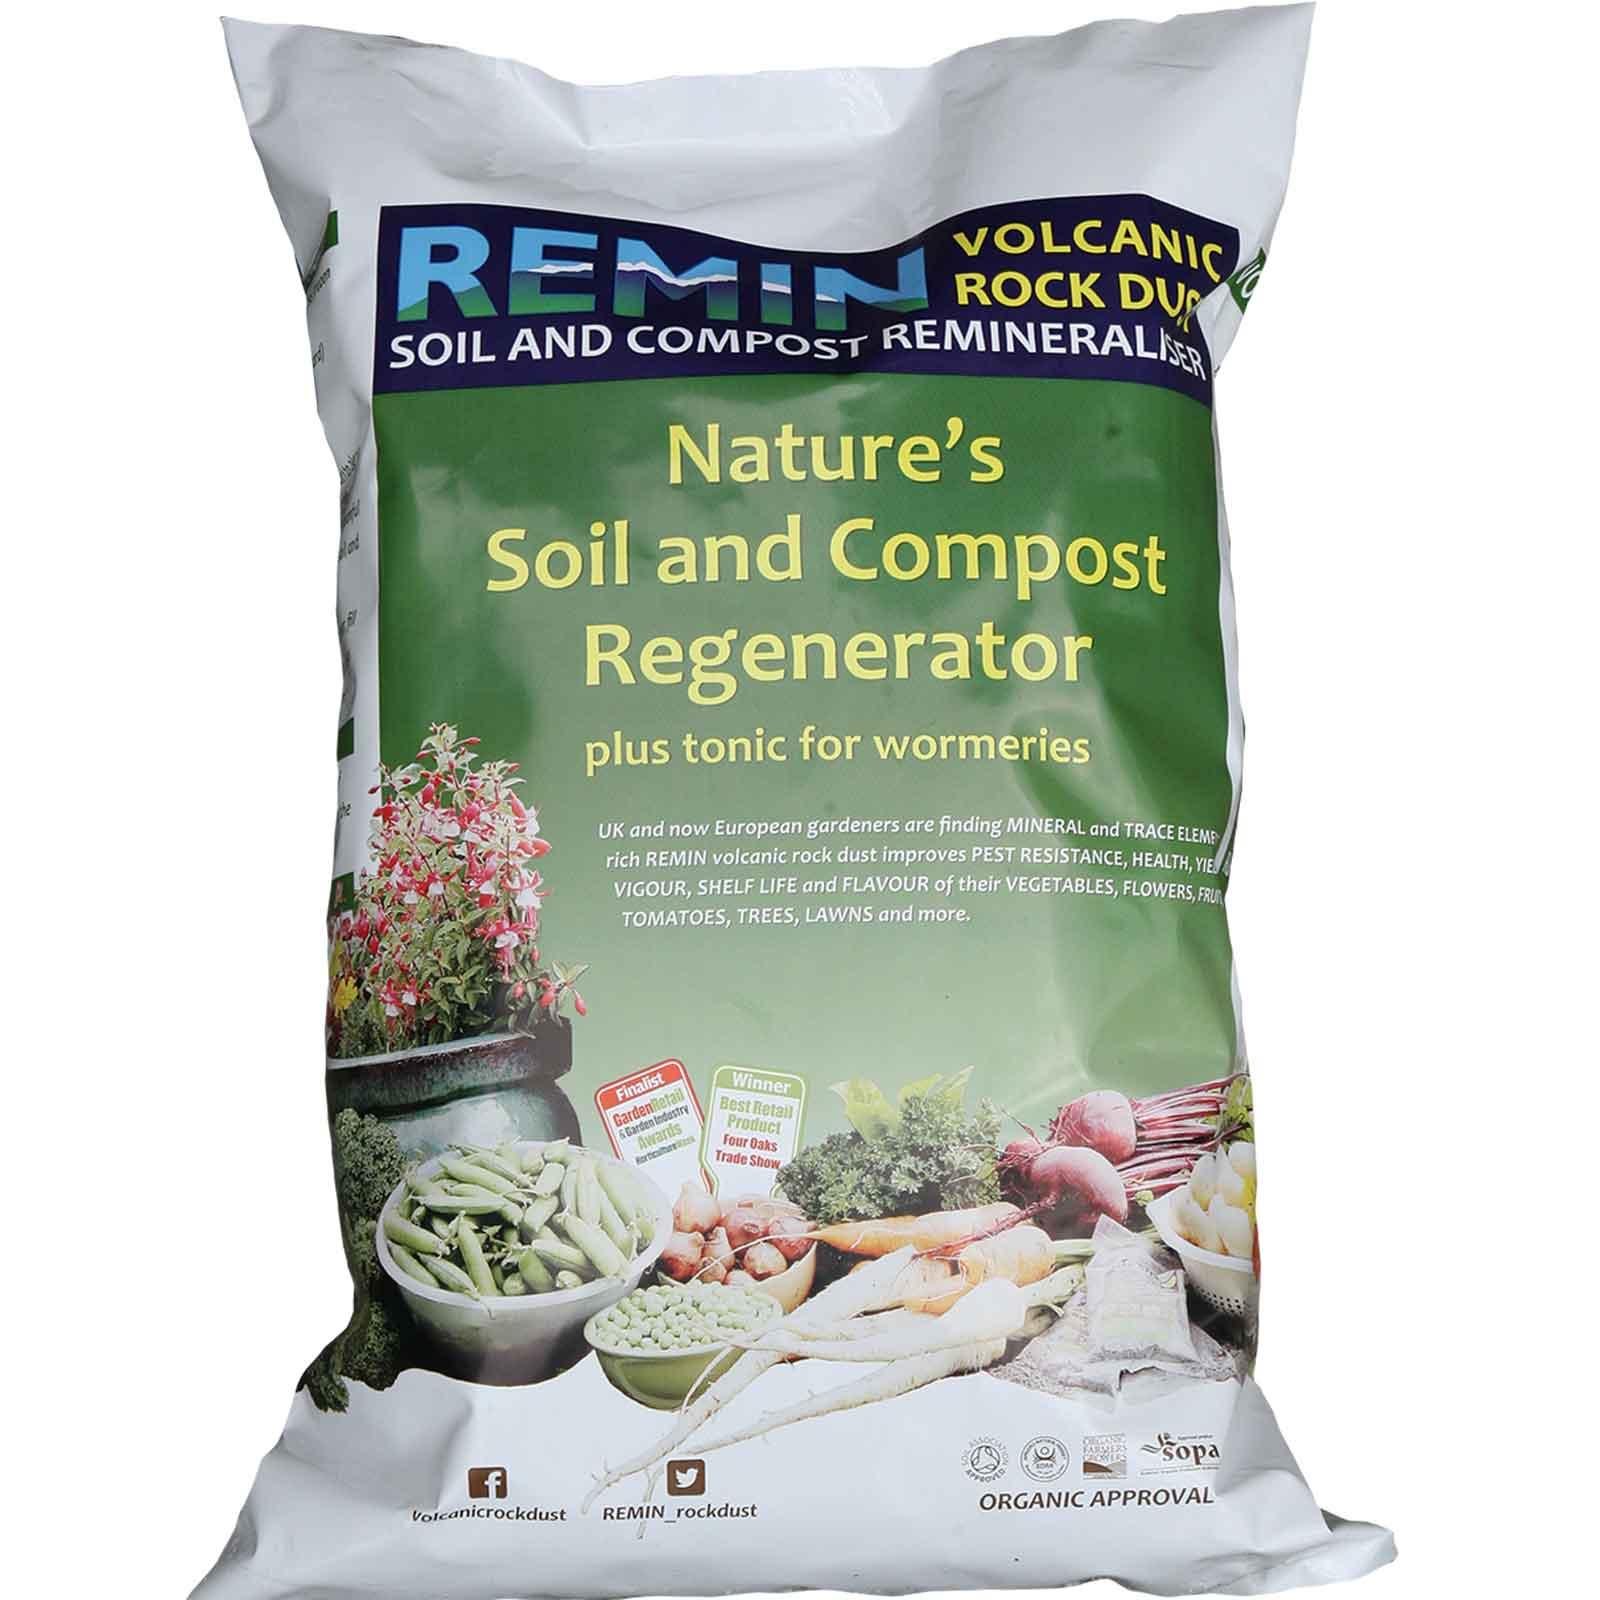 Remin Volcanic Rock Dust - 20kg Bag